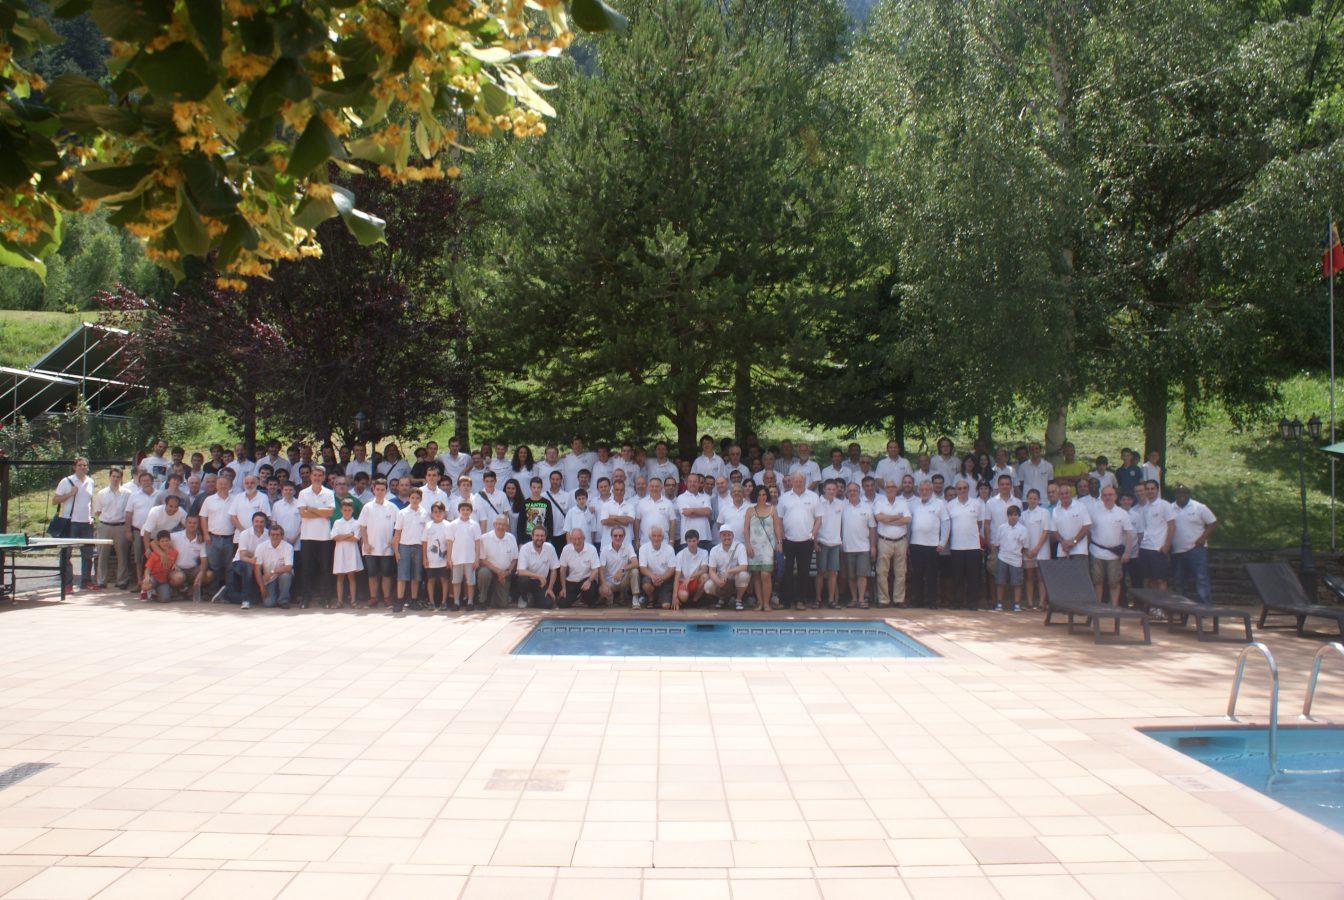 32 Open Andorra Hotel St. Gothard